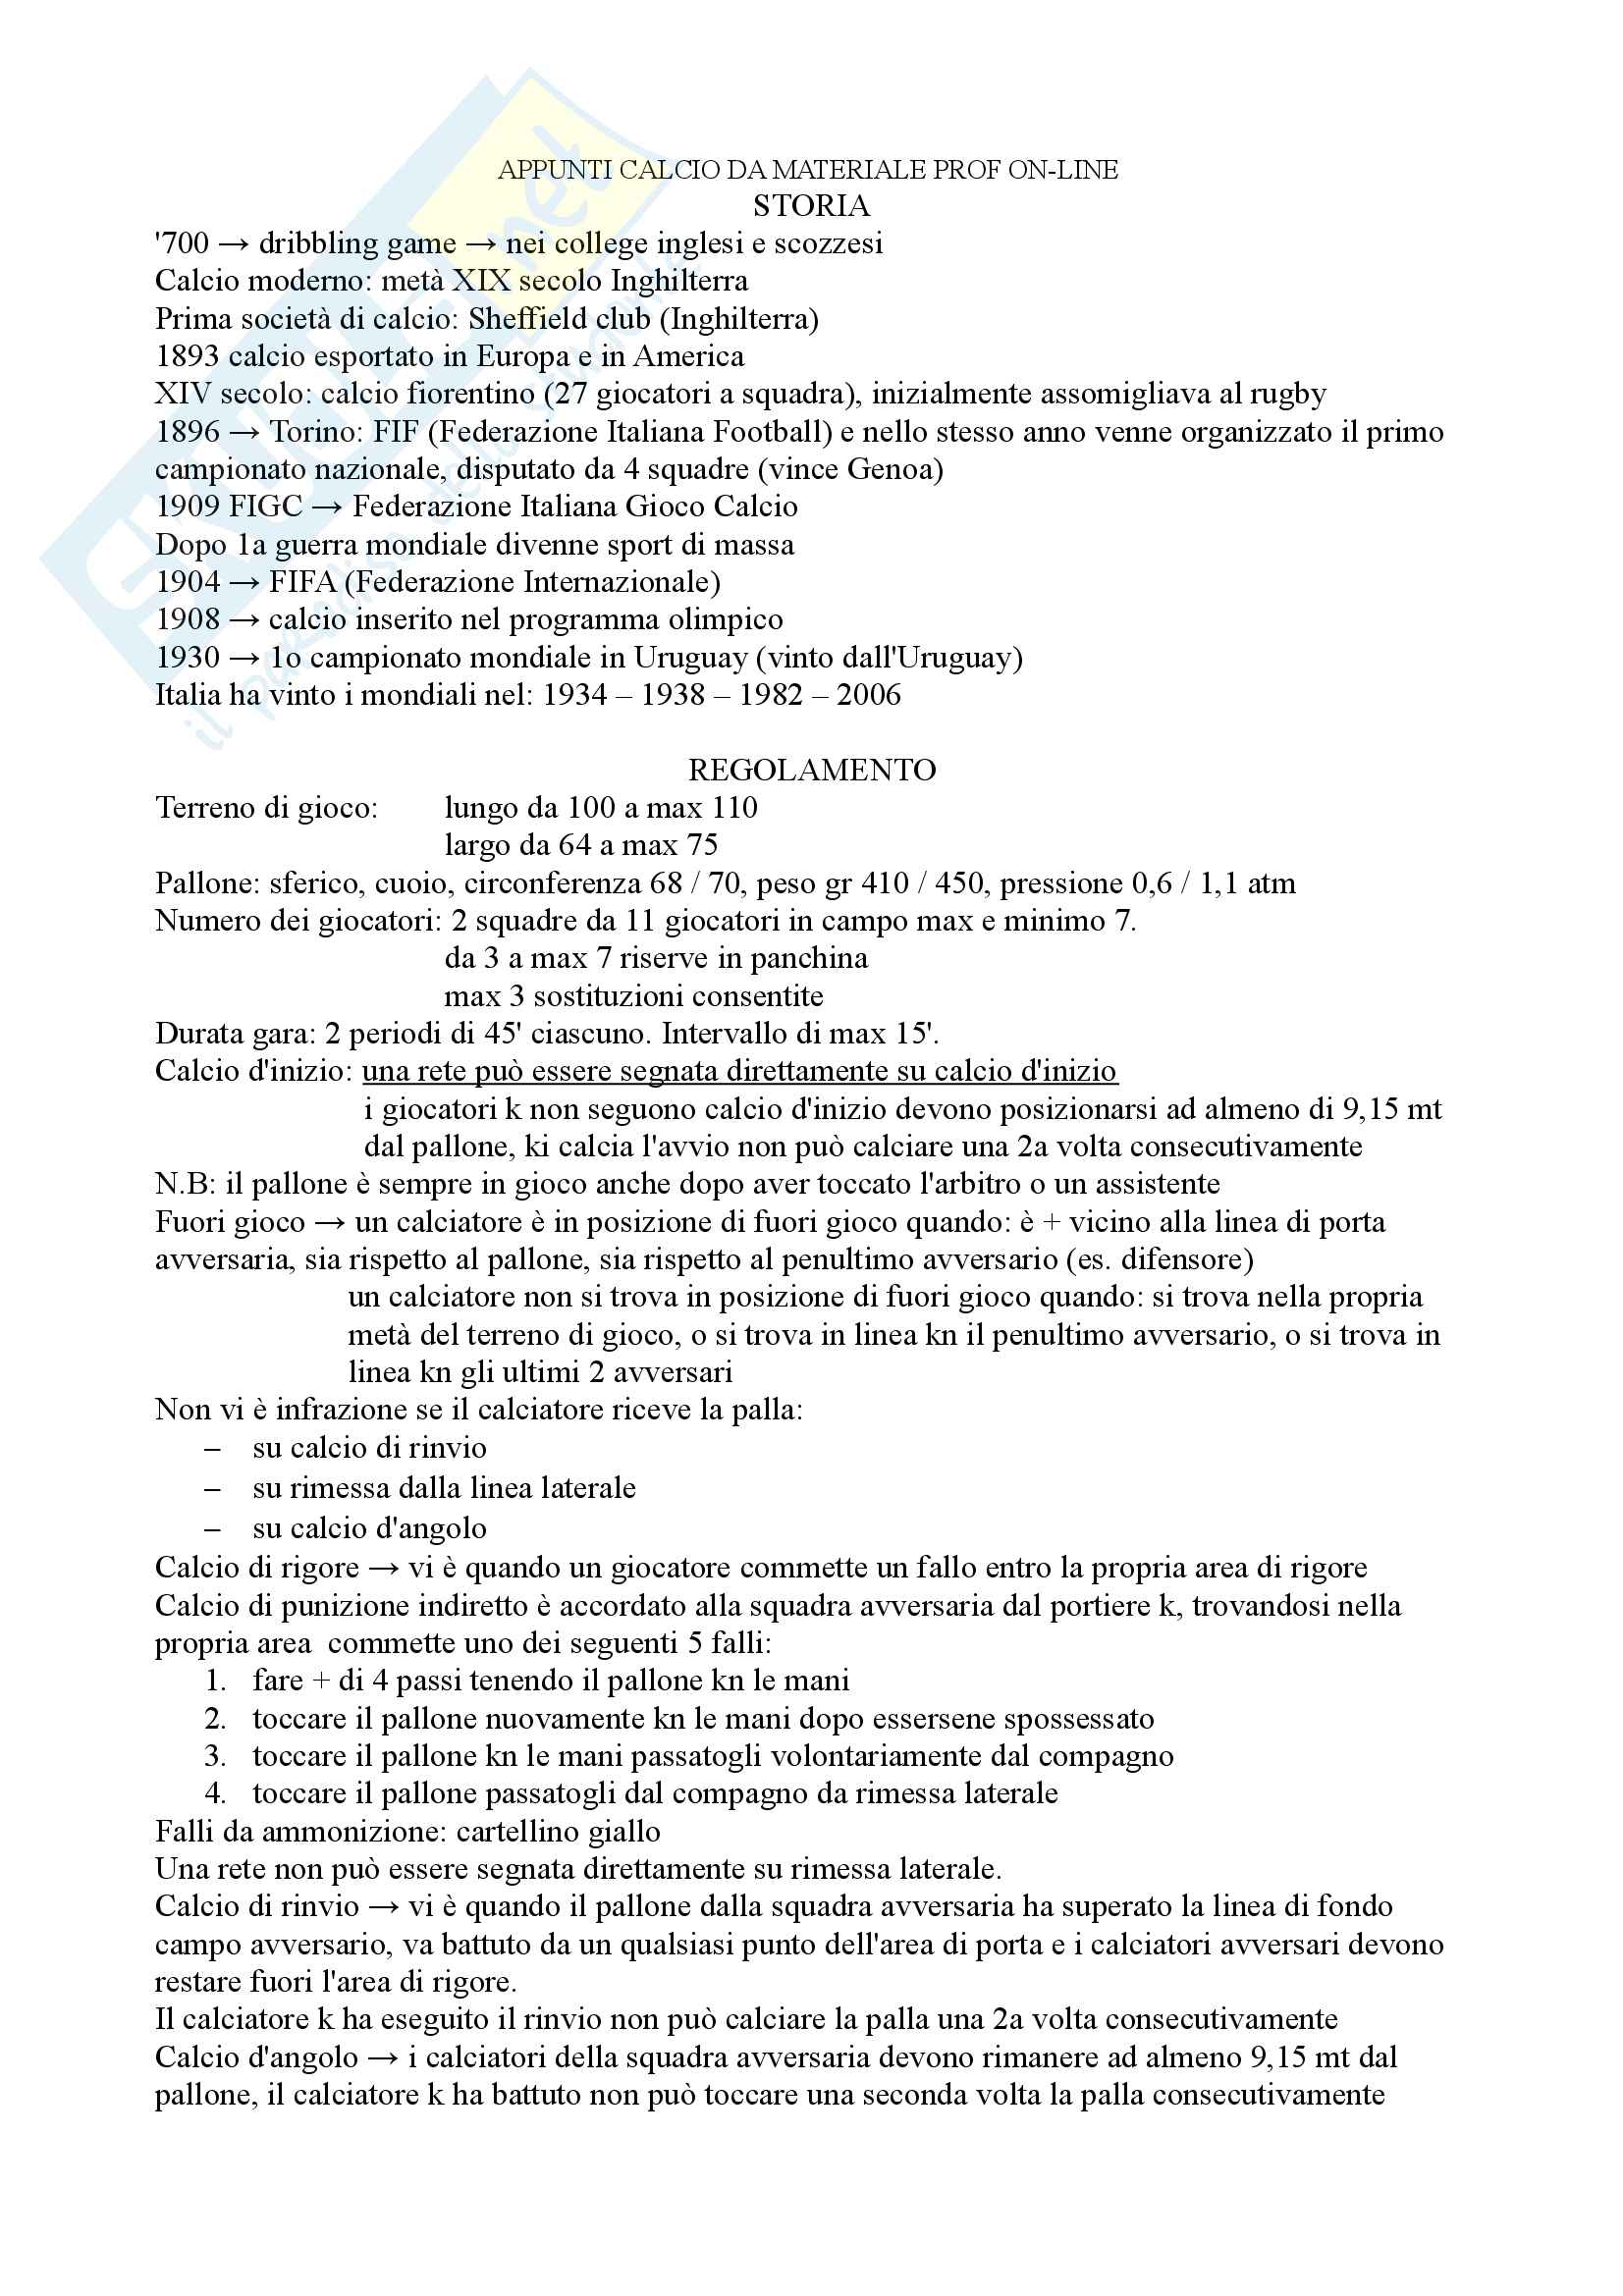 Calcio appunti materiale, prof. Bonali